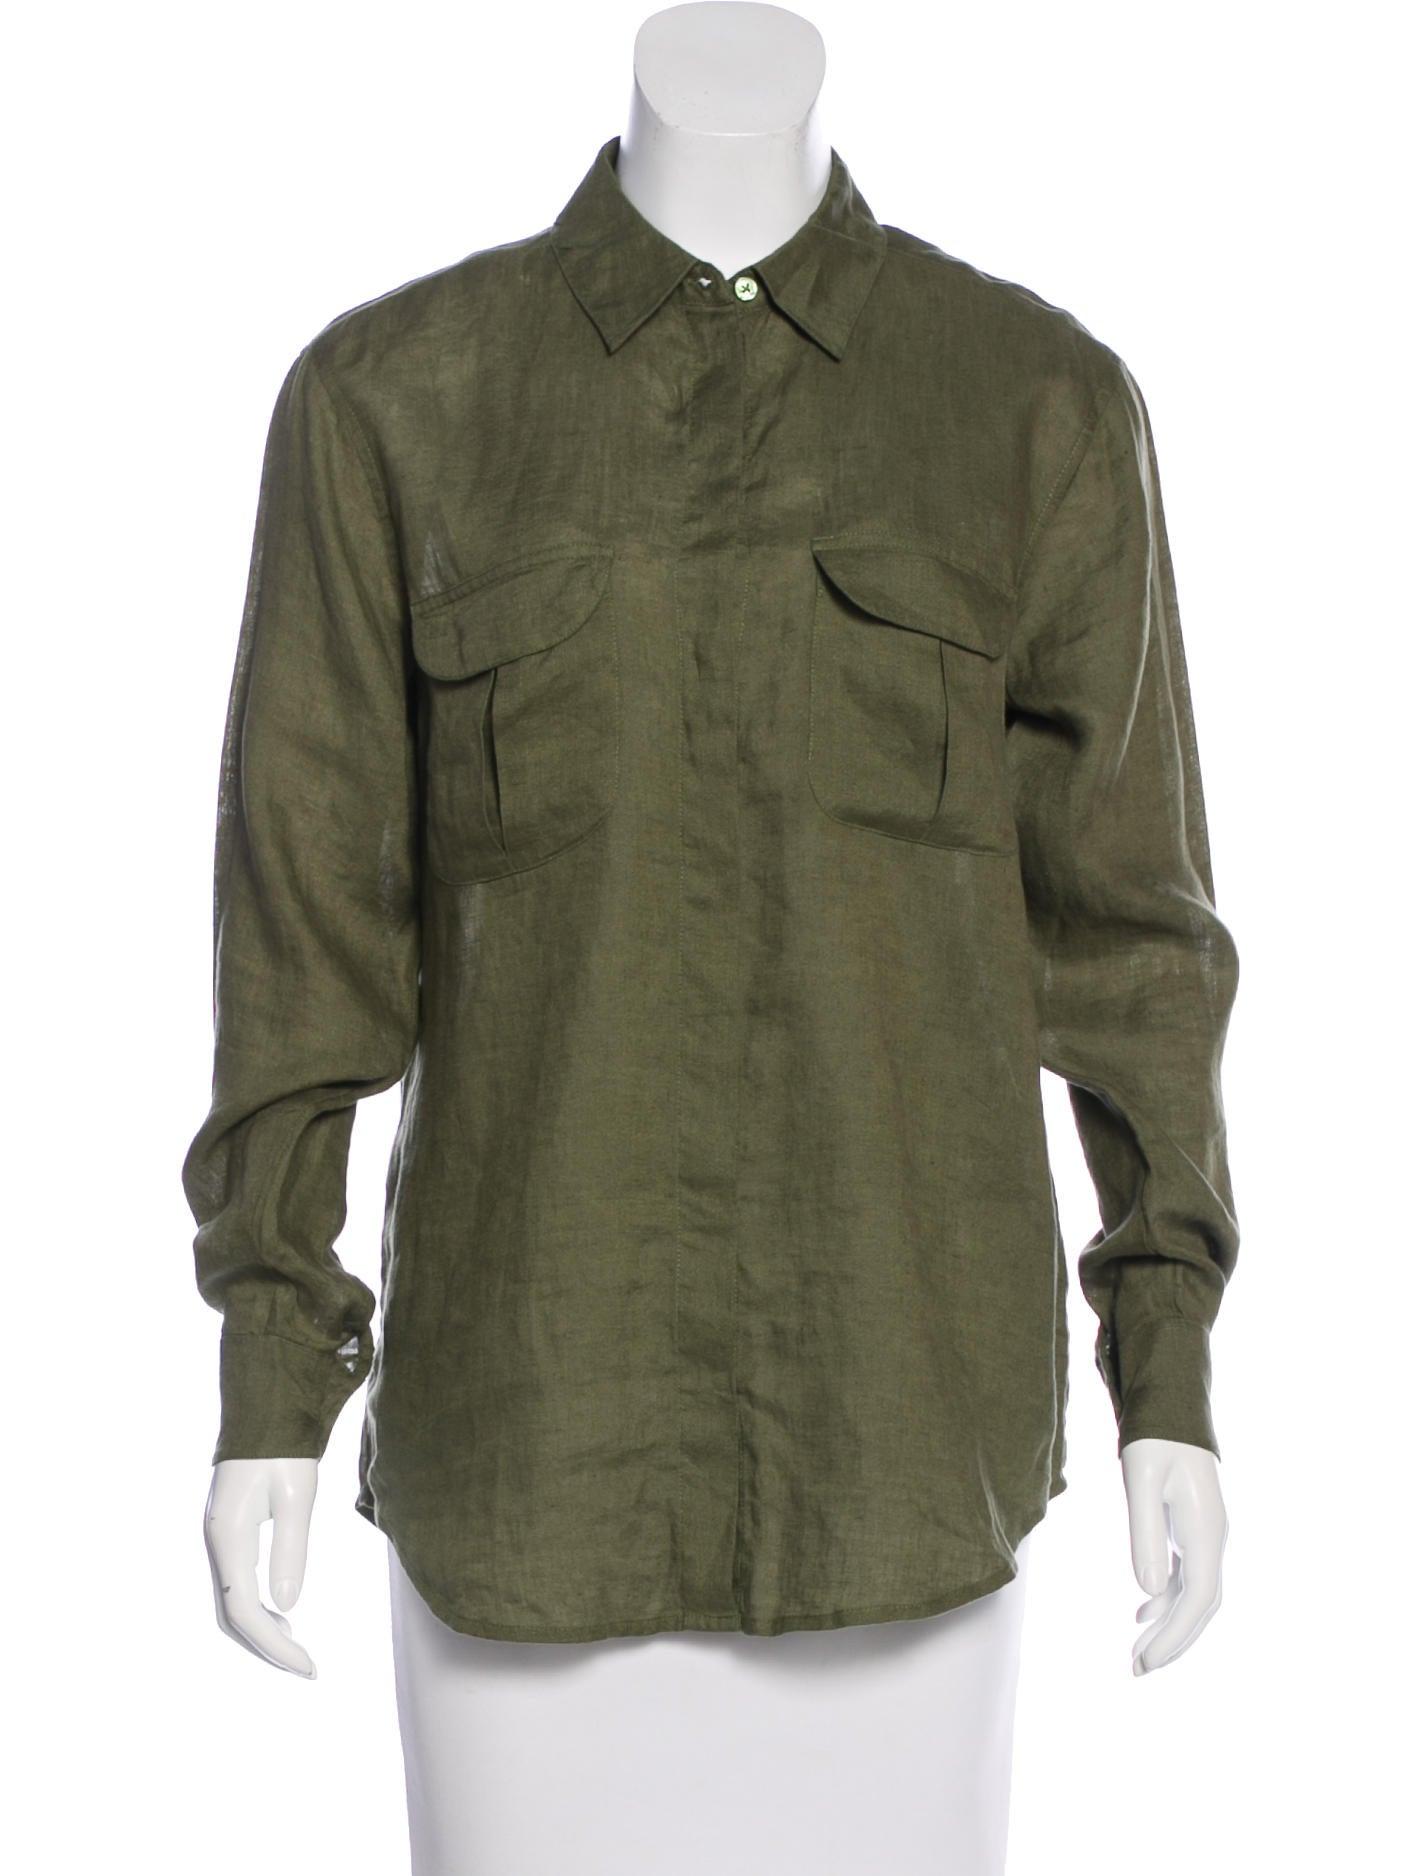 Equipment linen long sleeve shirt clothing weq34353 for Linen long sleeve shirt